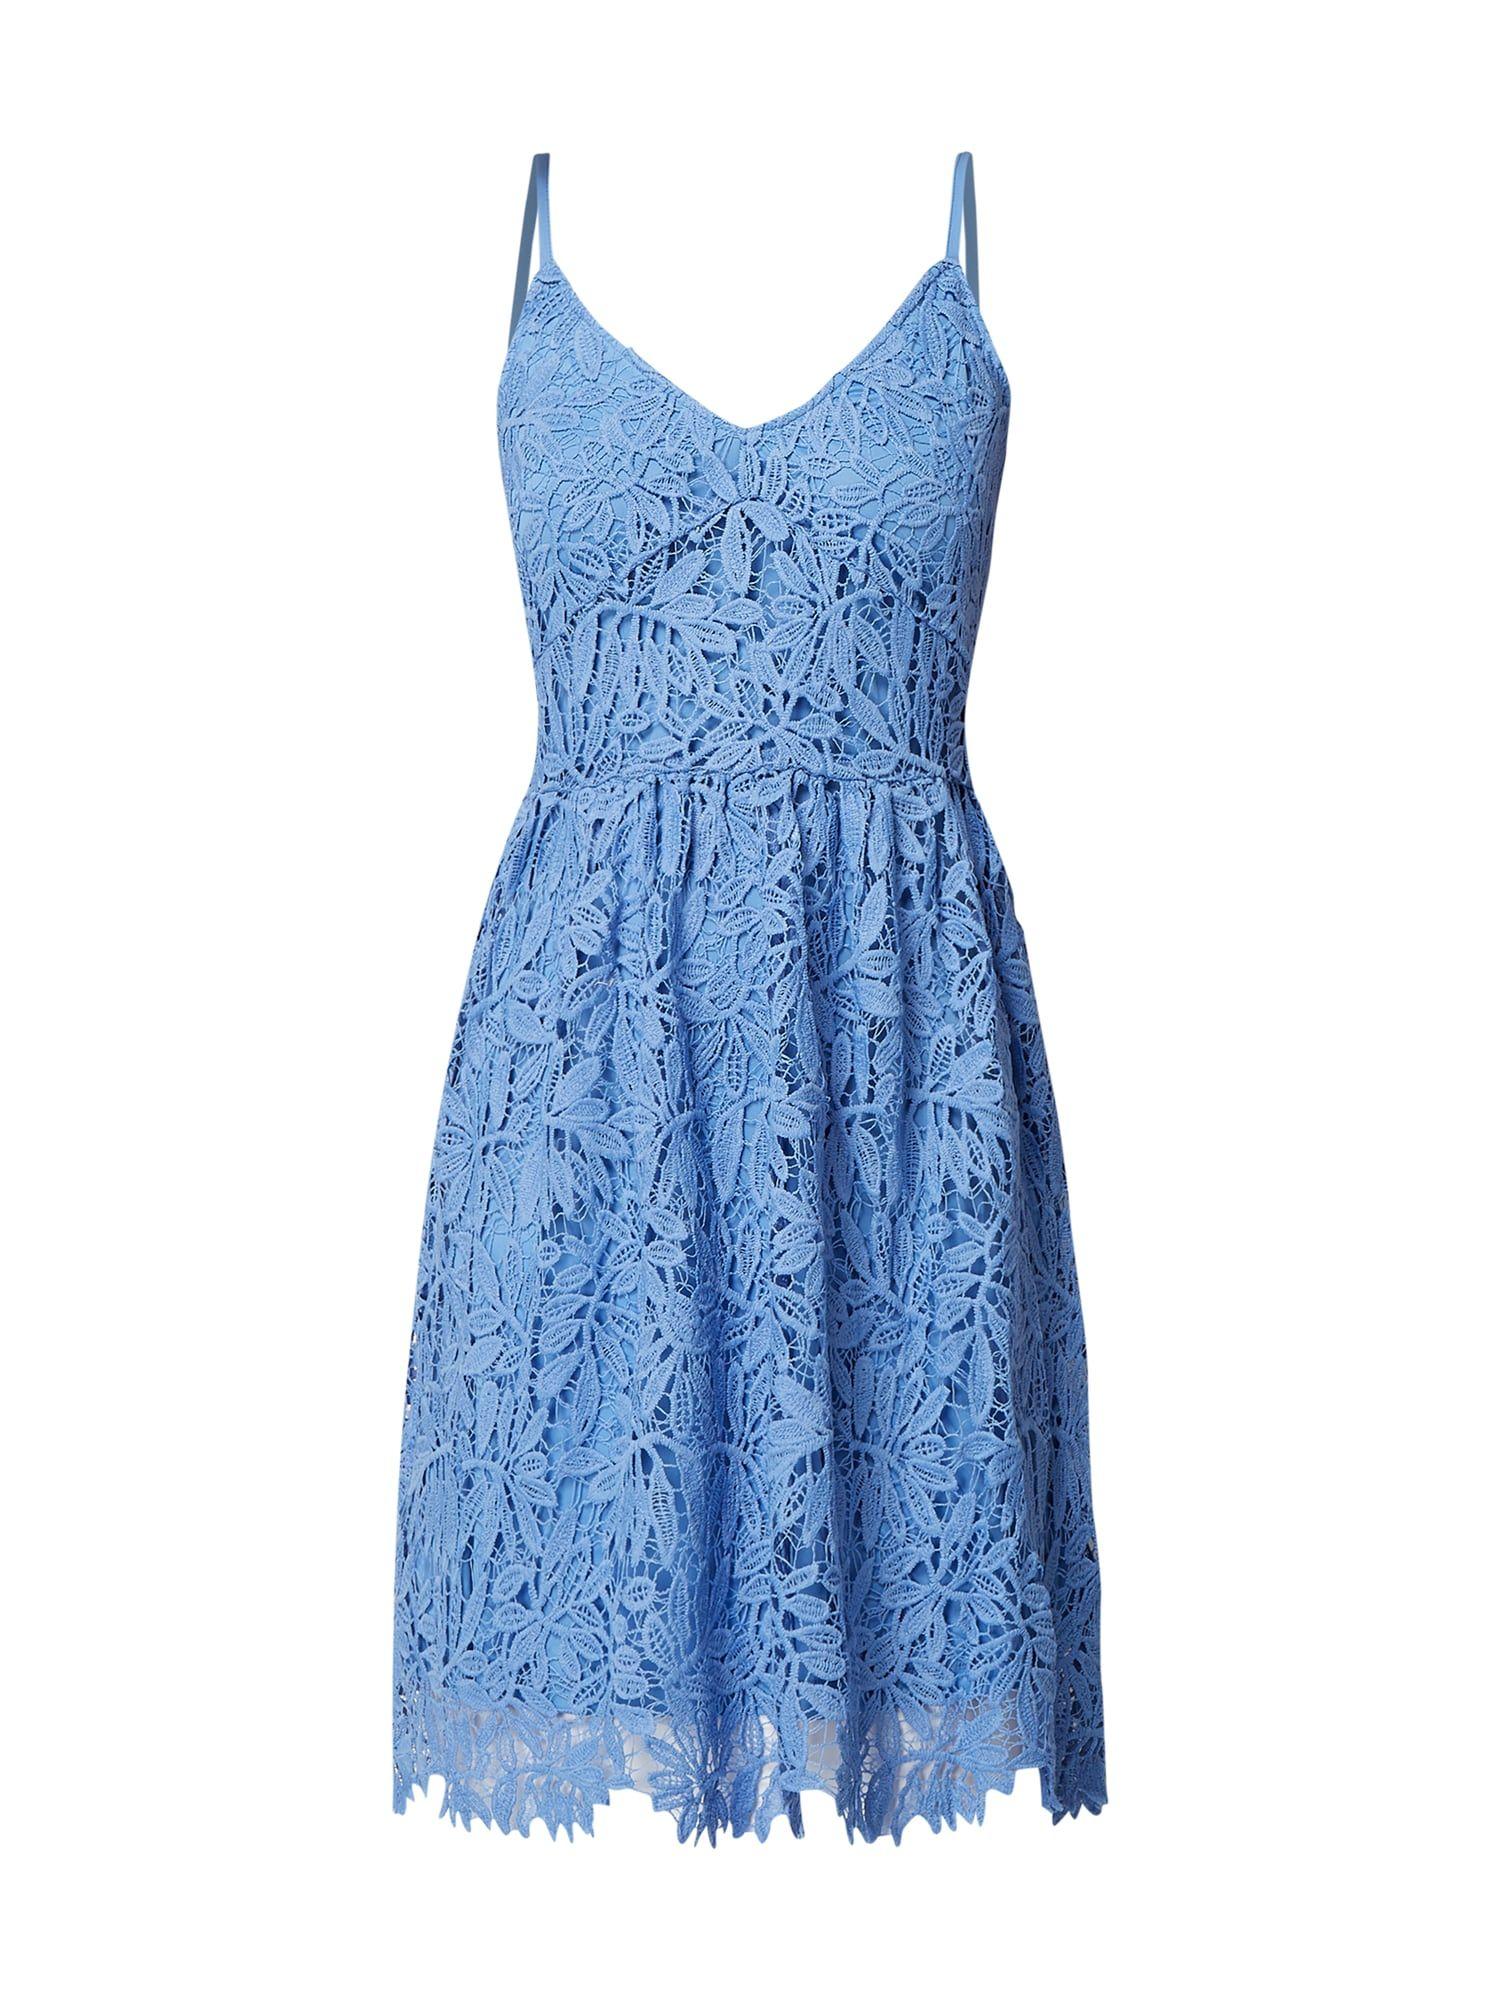 vero moda kleid aus häkelspitze in blau / türkis online